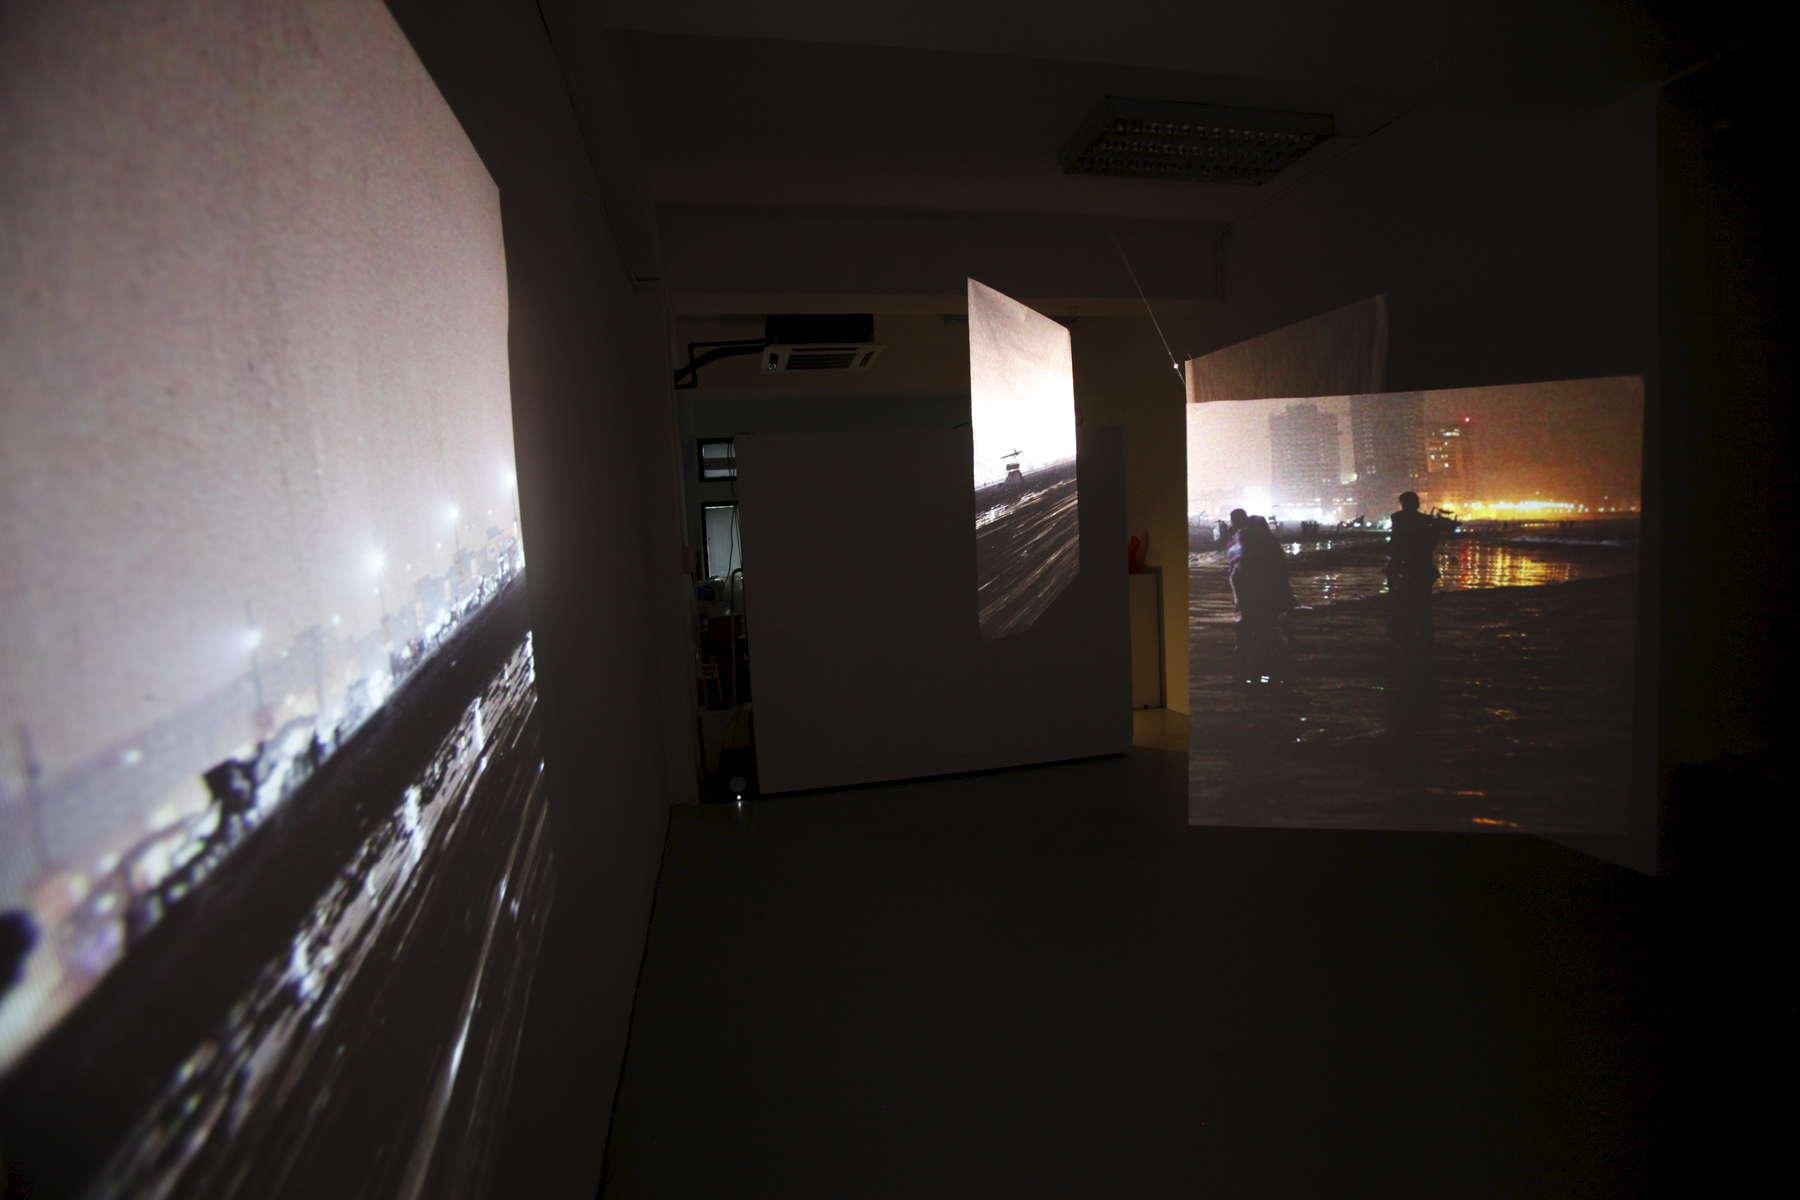 Installation view of work at Peninsular, Singapore